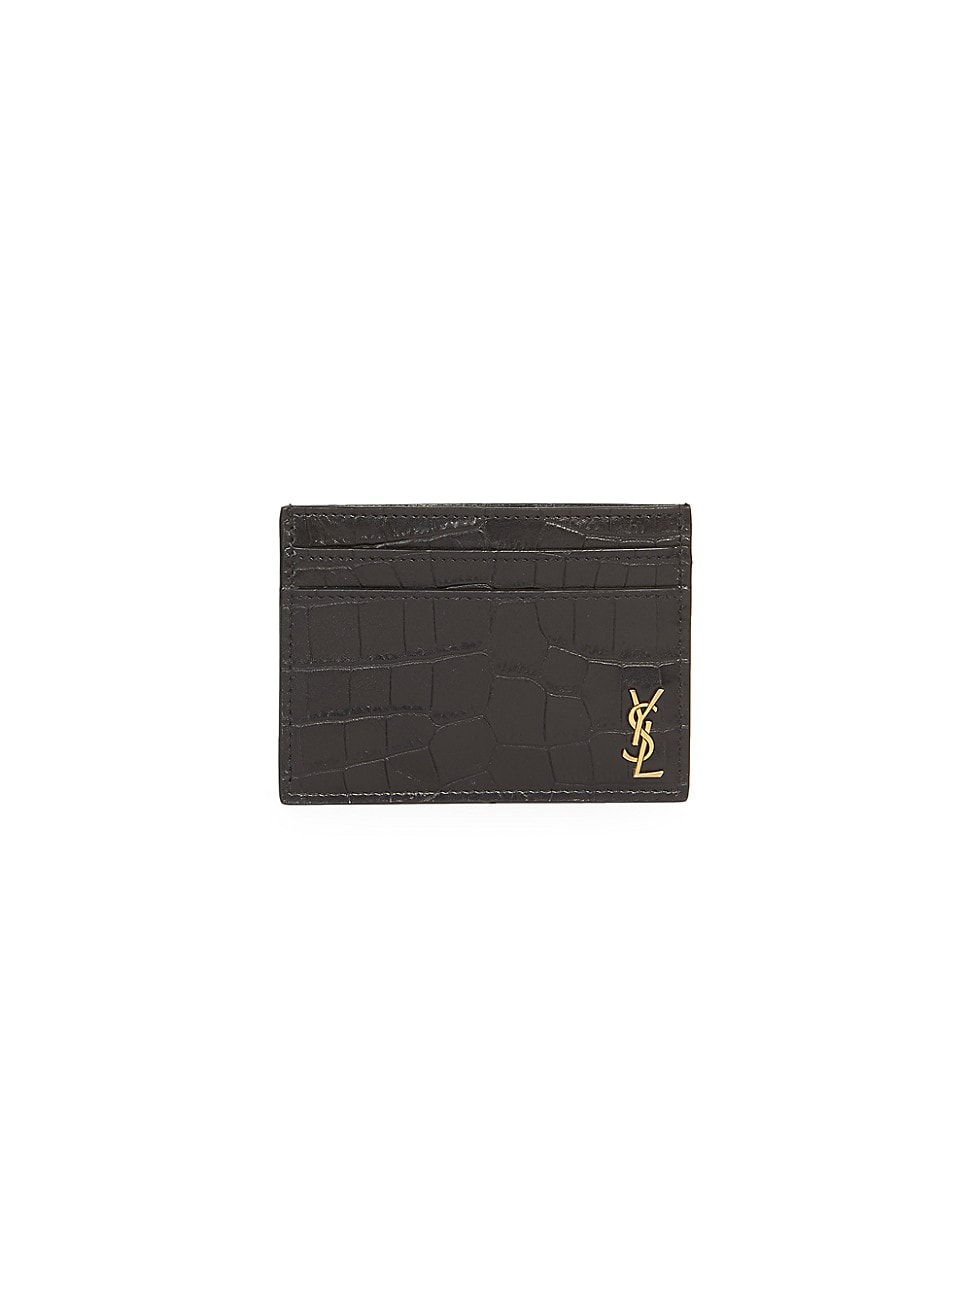 Saint Laurent Men's Croc-embossed Leather Credit Card Holder In Nero